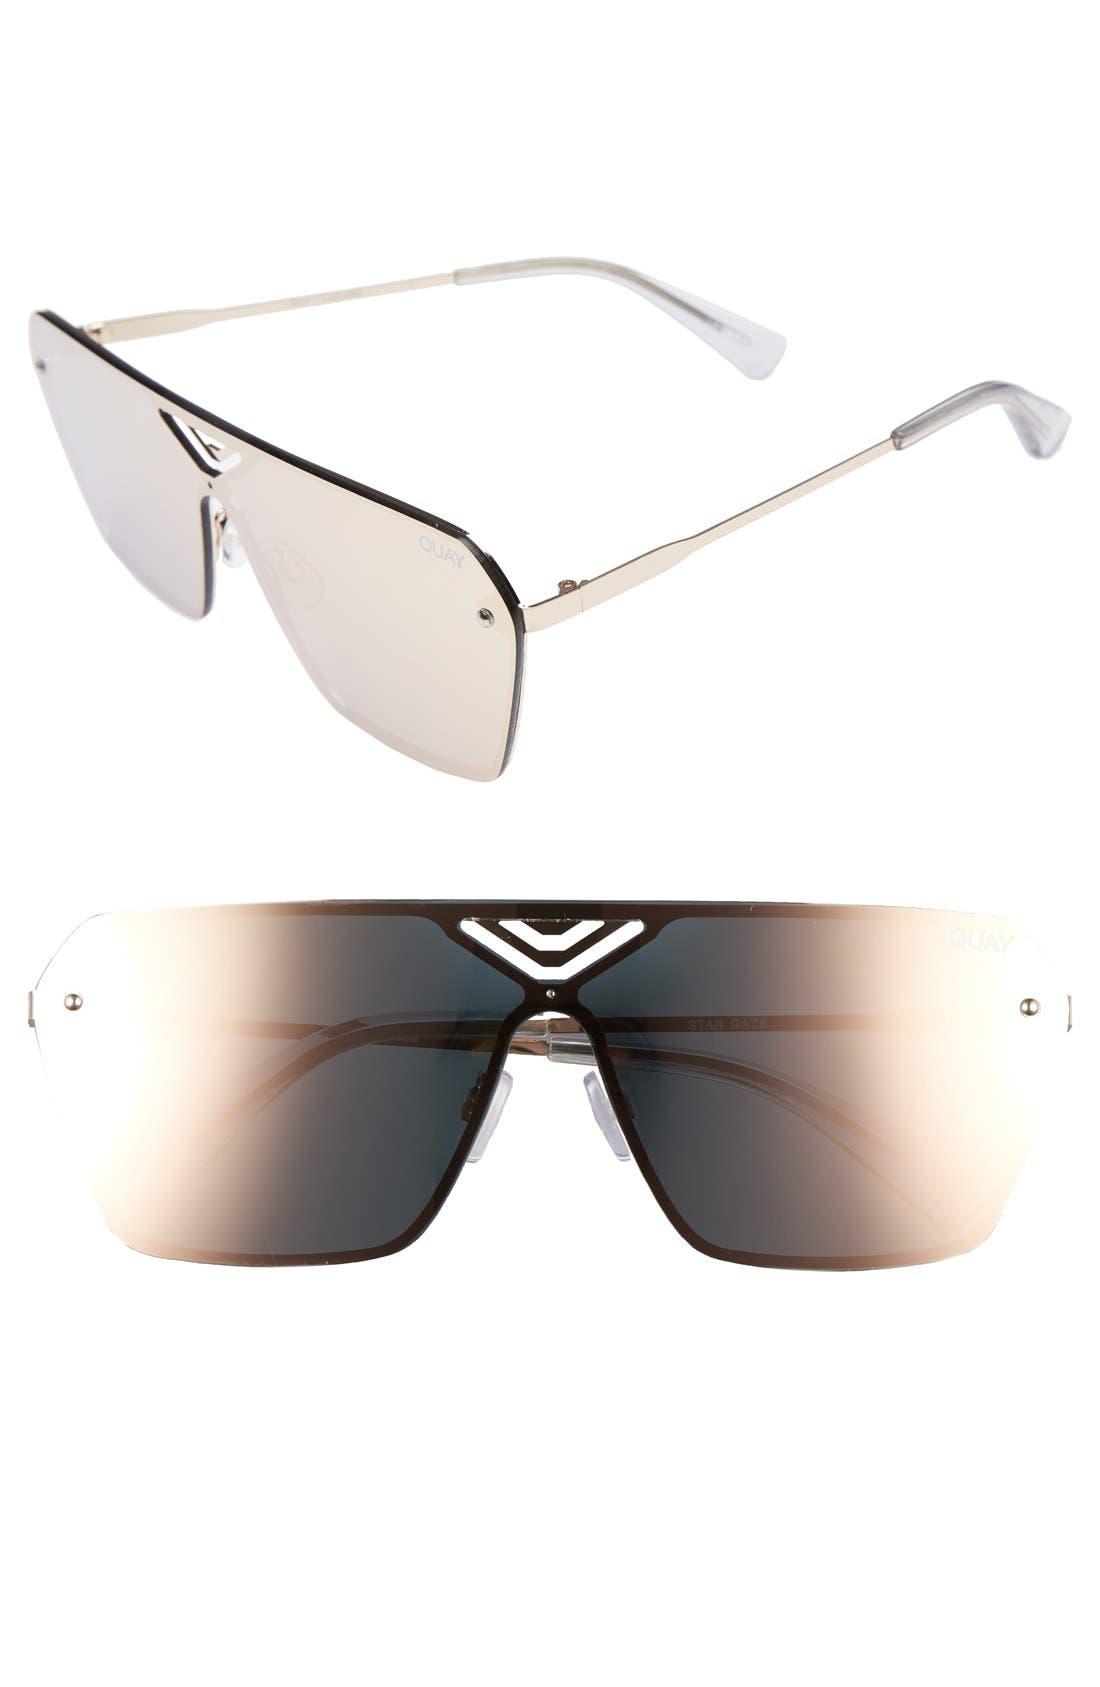 Star Gaze 68mm Mirrored Shield Sunglasses, Main, color, 710